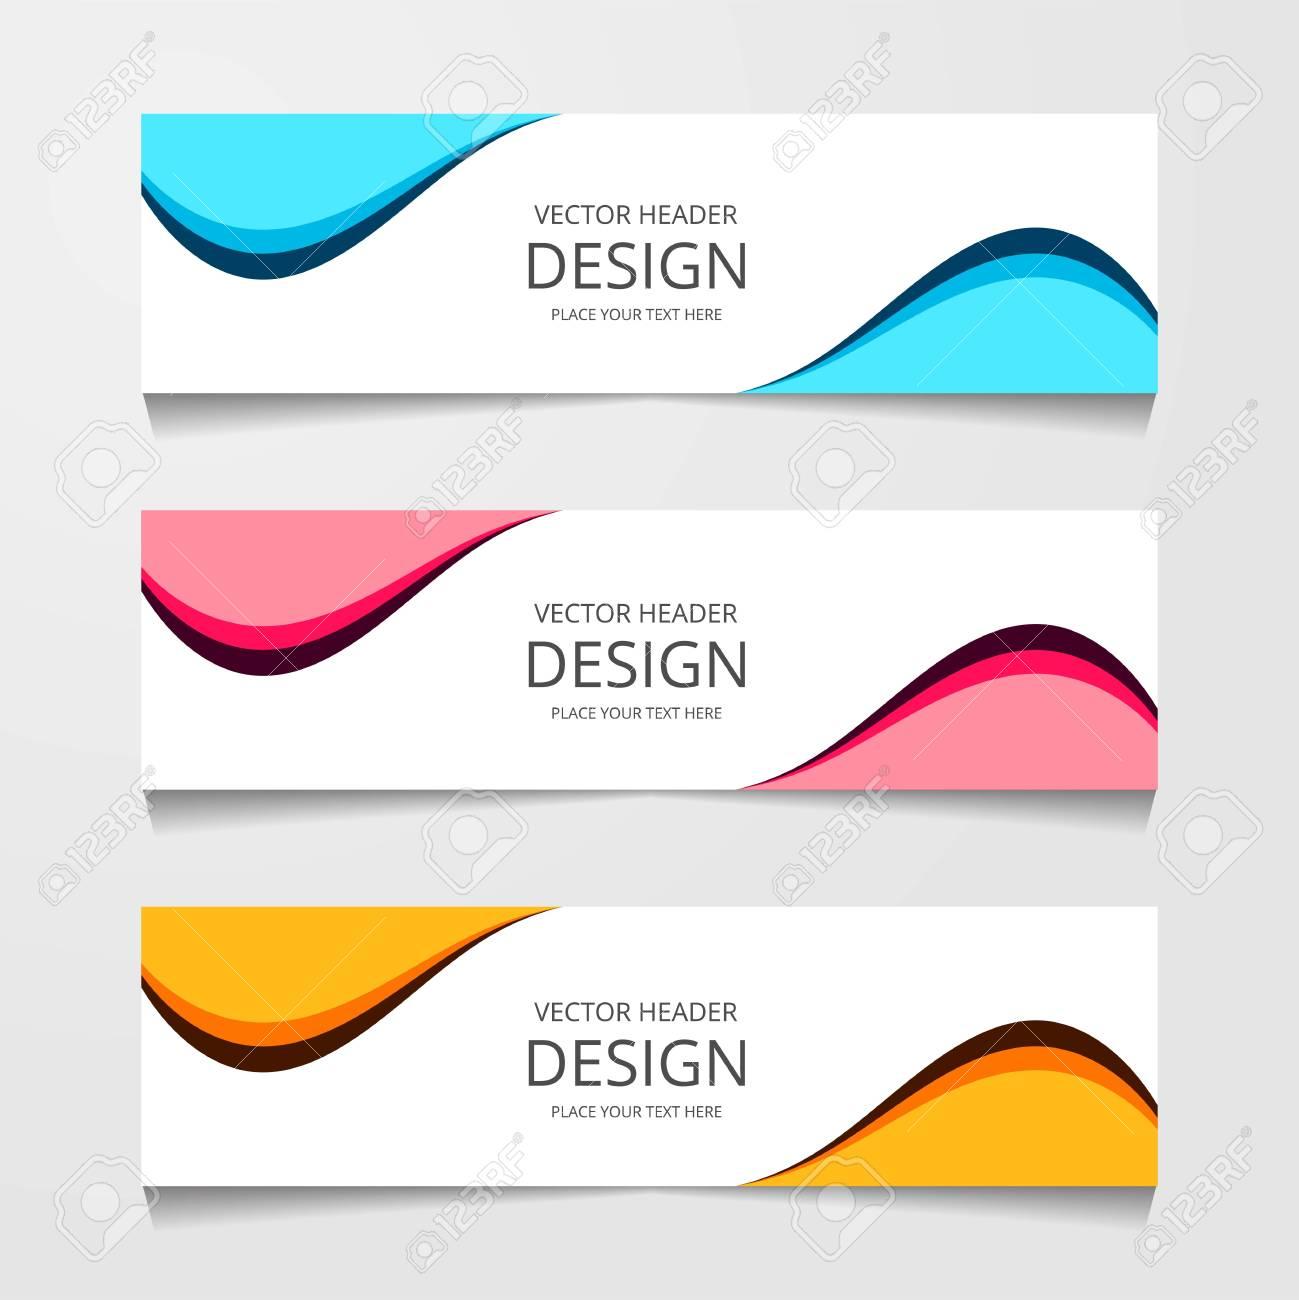 Abstract design banner, web template, layout header templates, modern vector illustration - 112314908